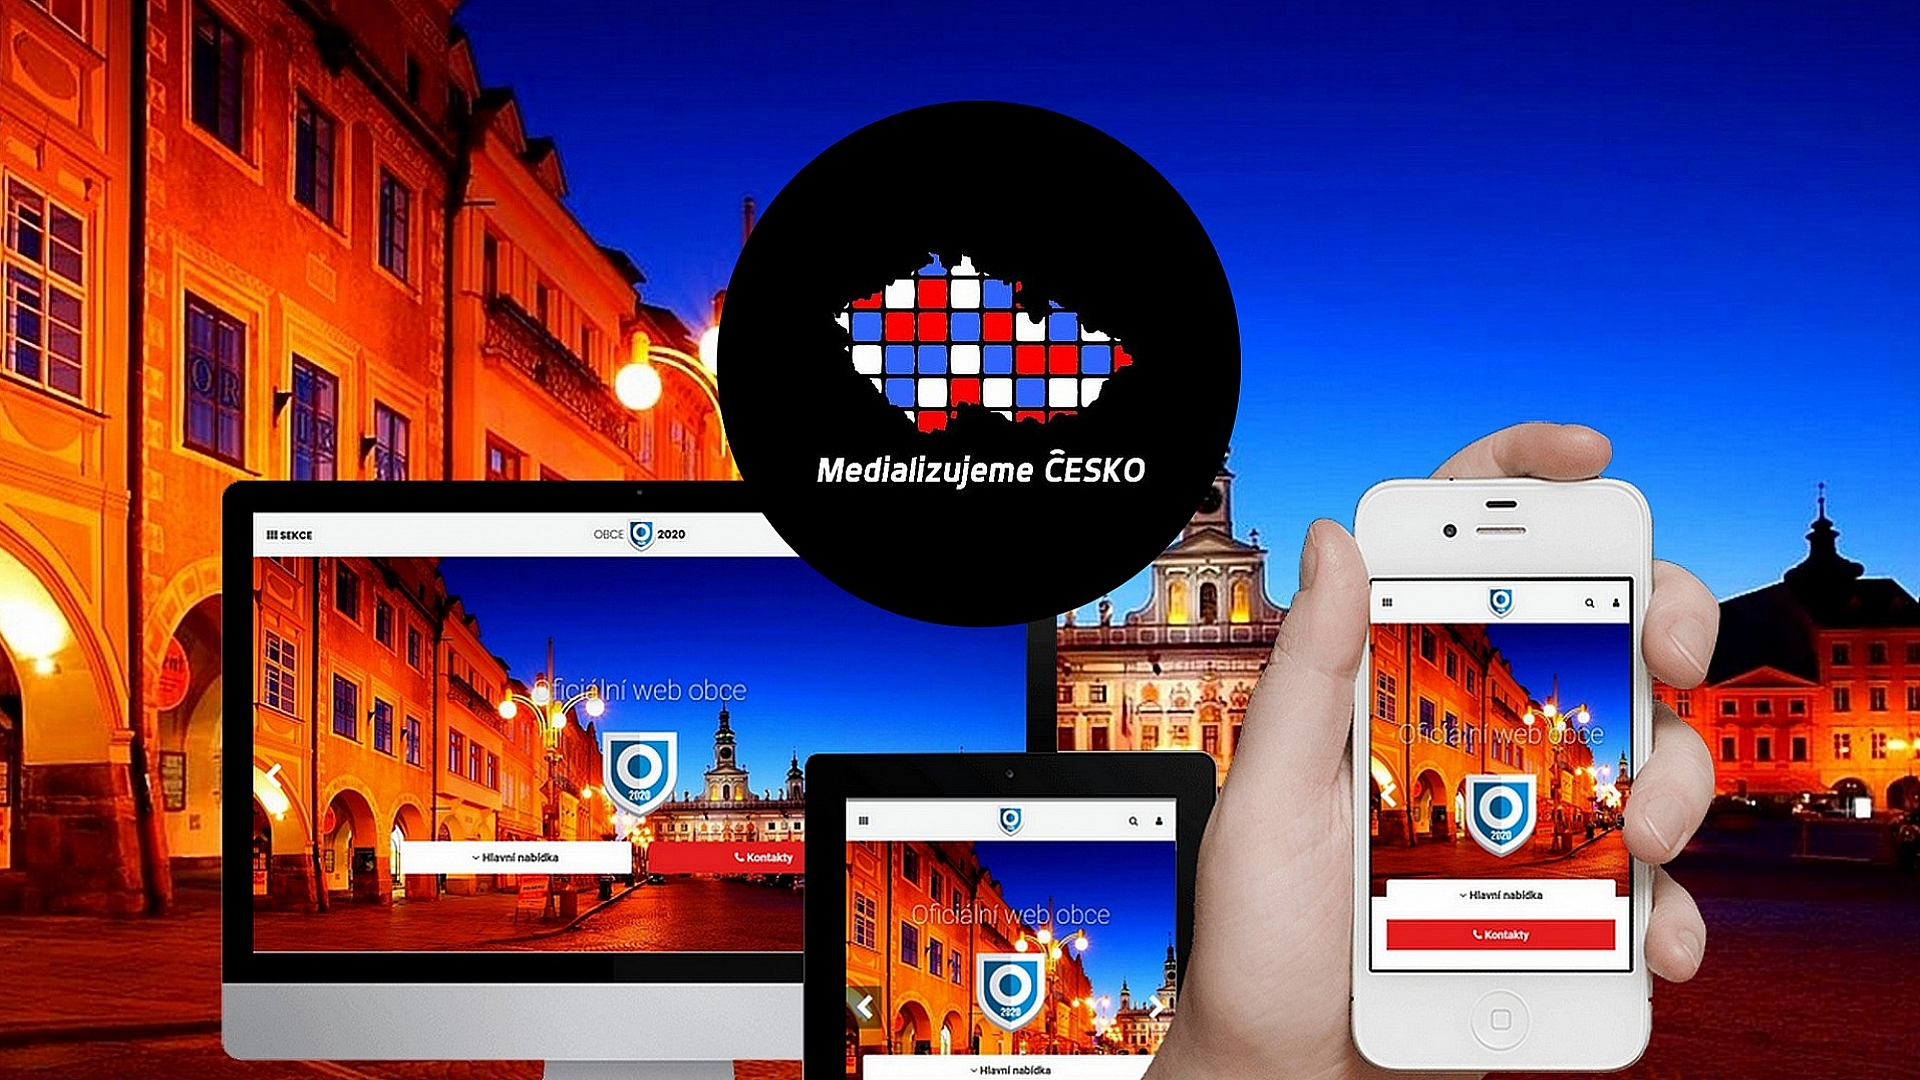 Medializujeme Česko.cz - Medializujeme Česko.cz